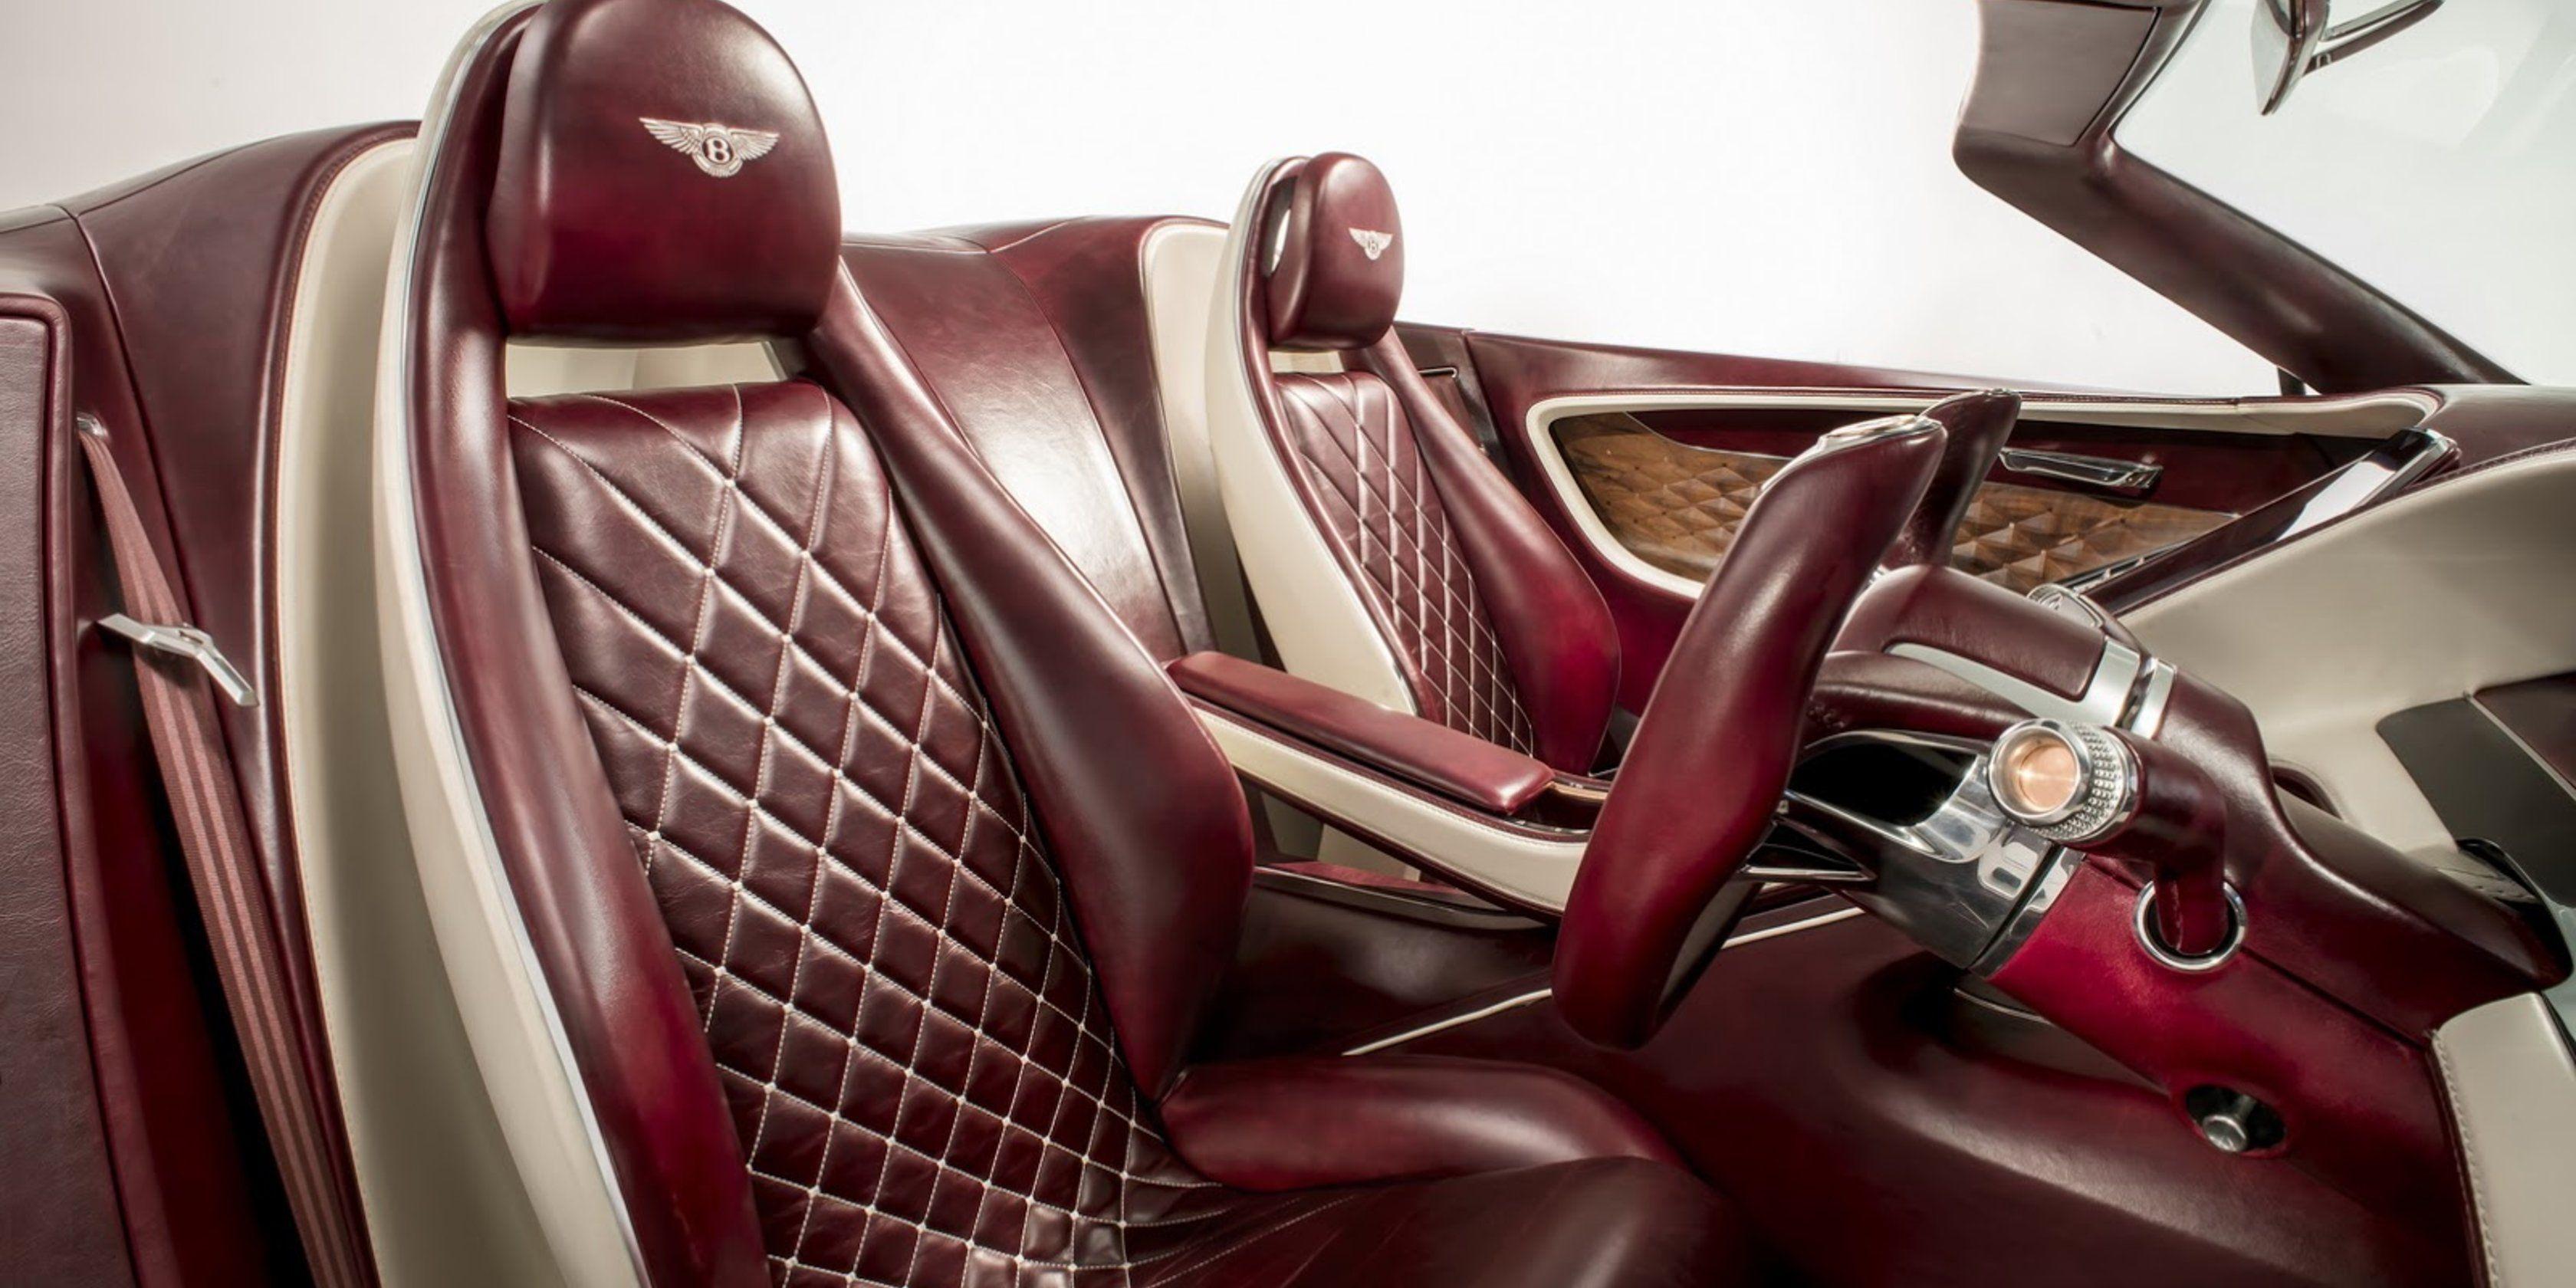 Bentley EXP 12 Speed 6e concept revealed s 1 of 8